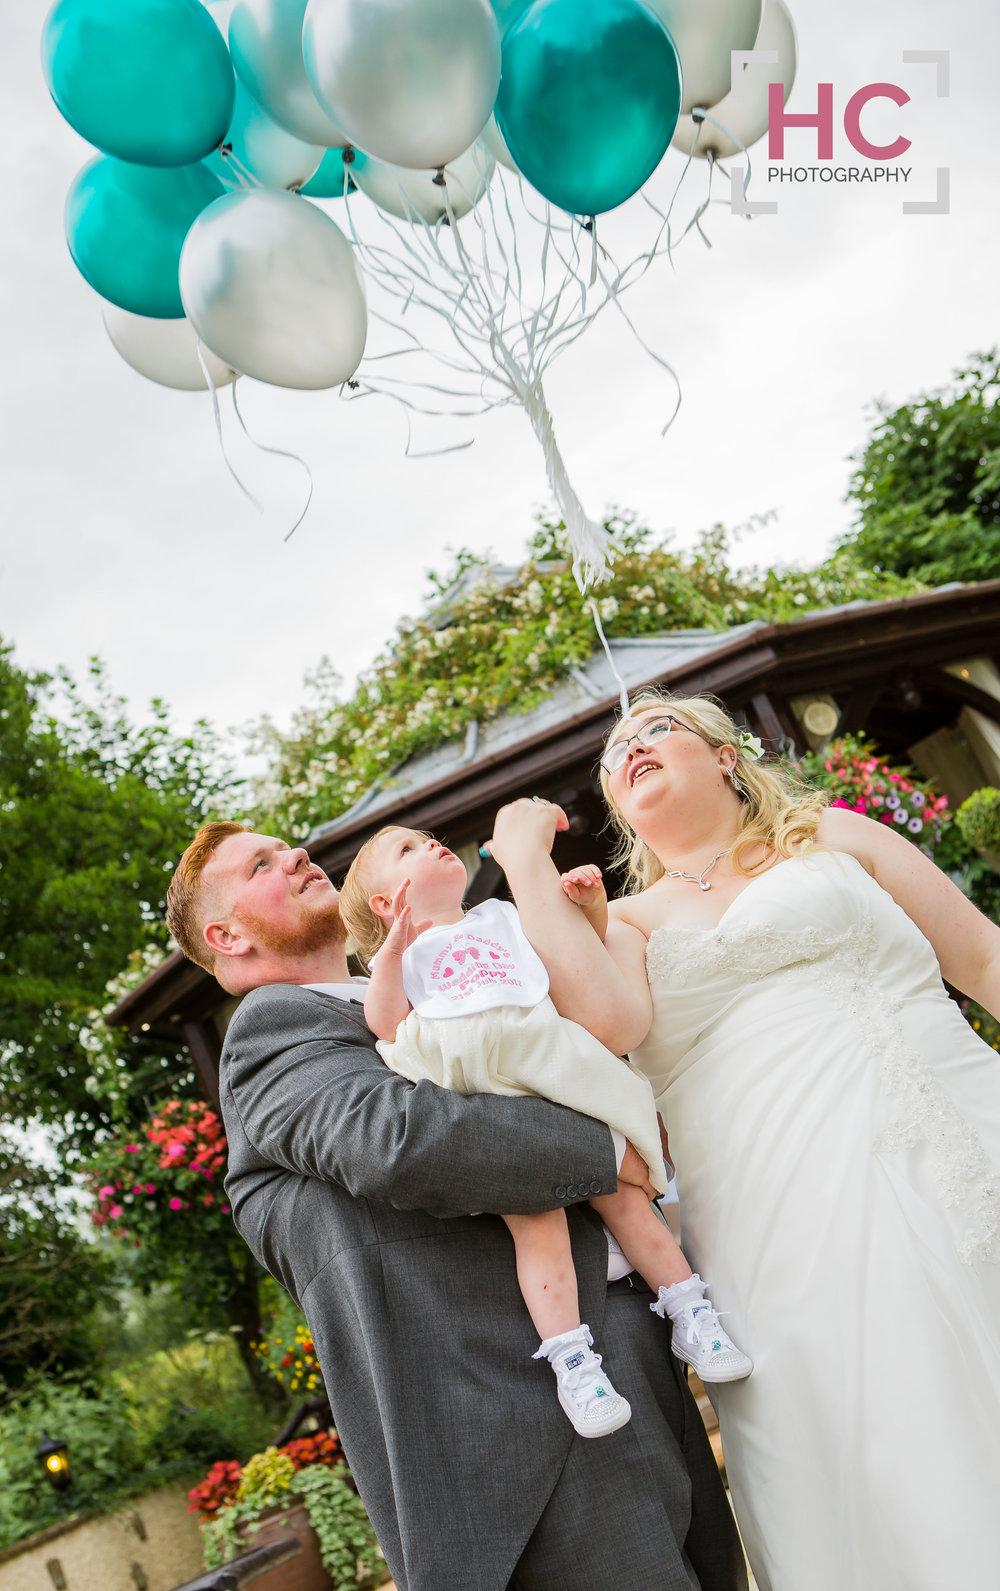 Chloe & Pete's Wedding_Helen Cotton Photography©45.JPG